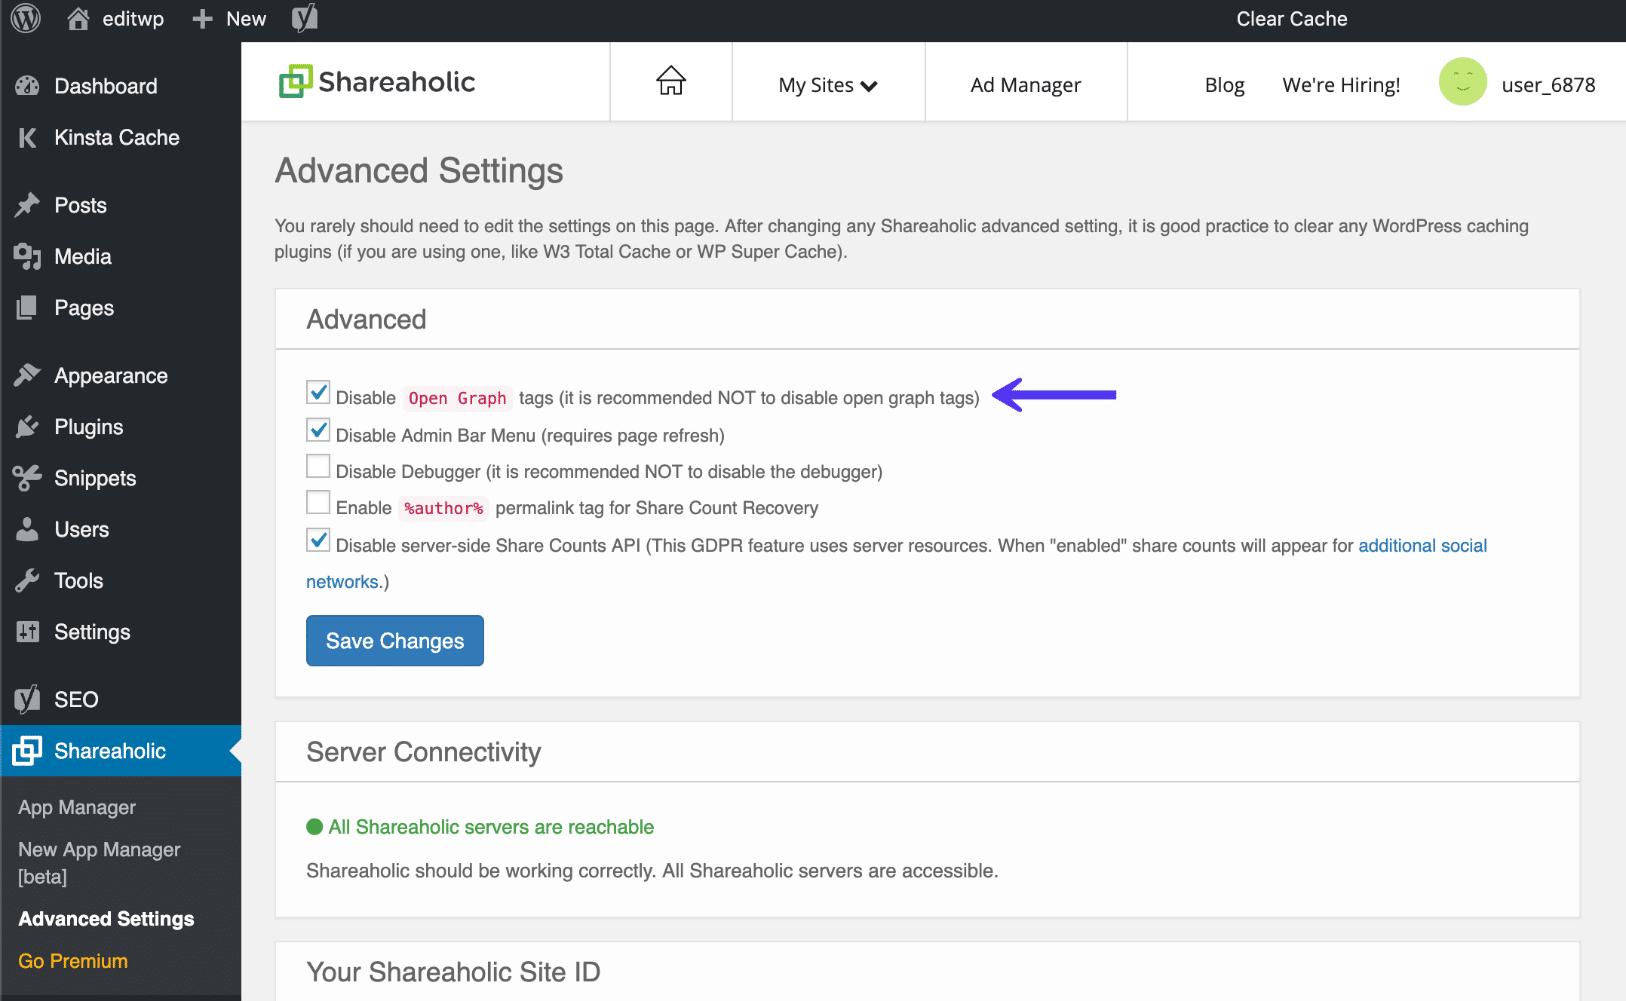 Shareaholic desativar tags de gráfico aberto